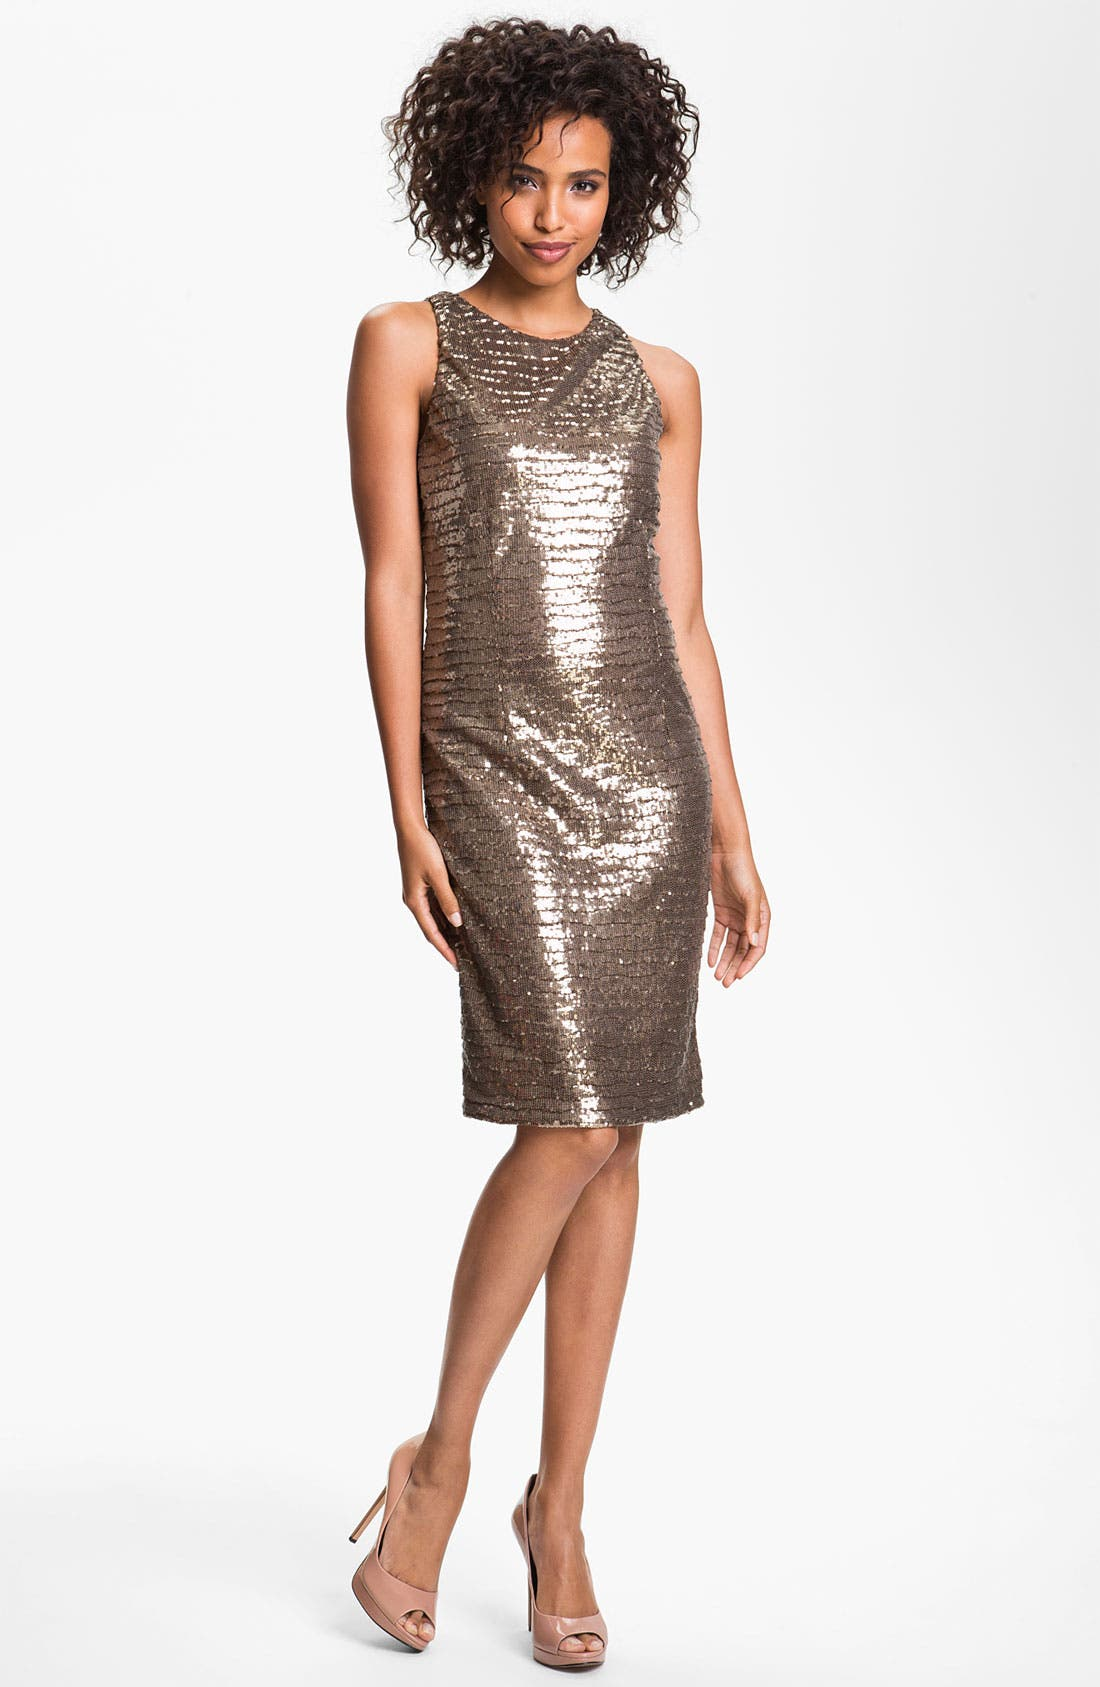 Main Image - Betsy & Adam Back Cutout Metallic Sequin Dress